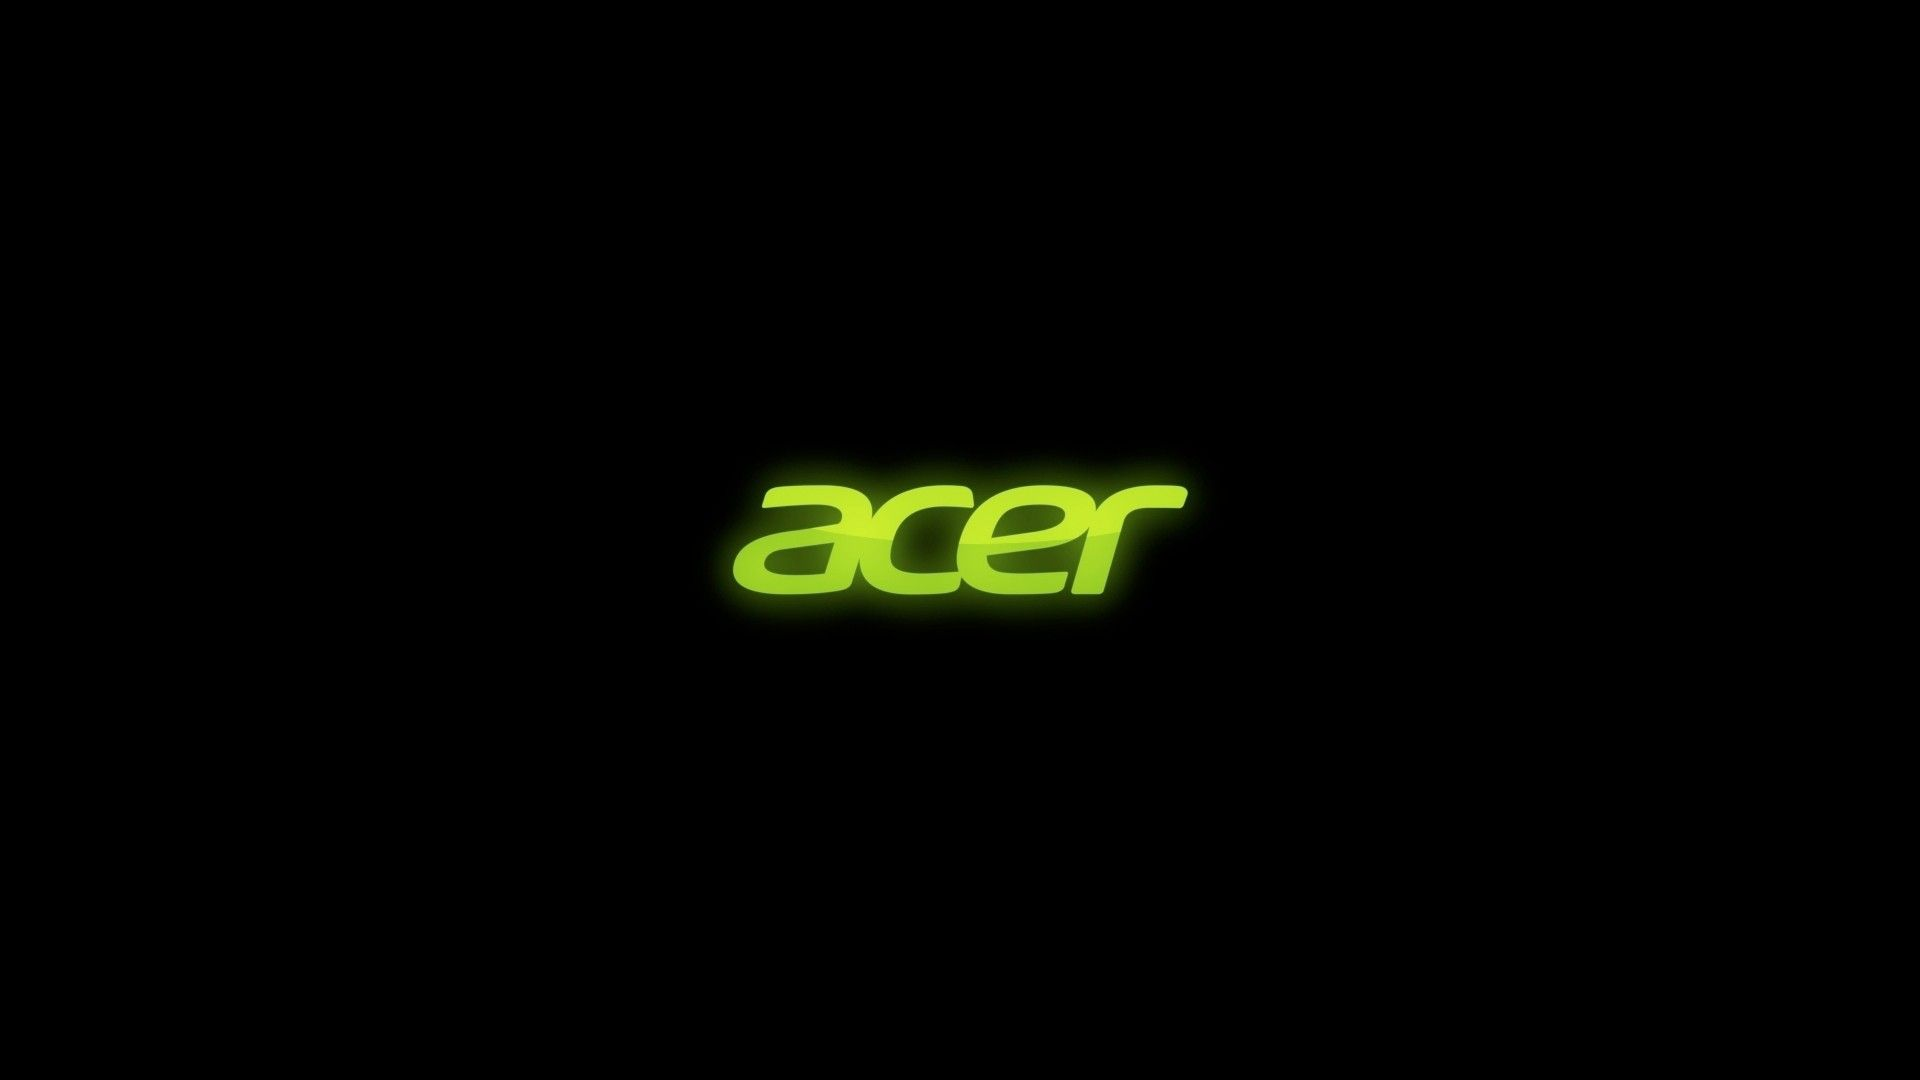 1920x1080 Preview Wallpaper Acer Firm Green Black 1920x1080 Acer Desktop Acer Best Laptop Brands